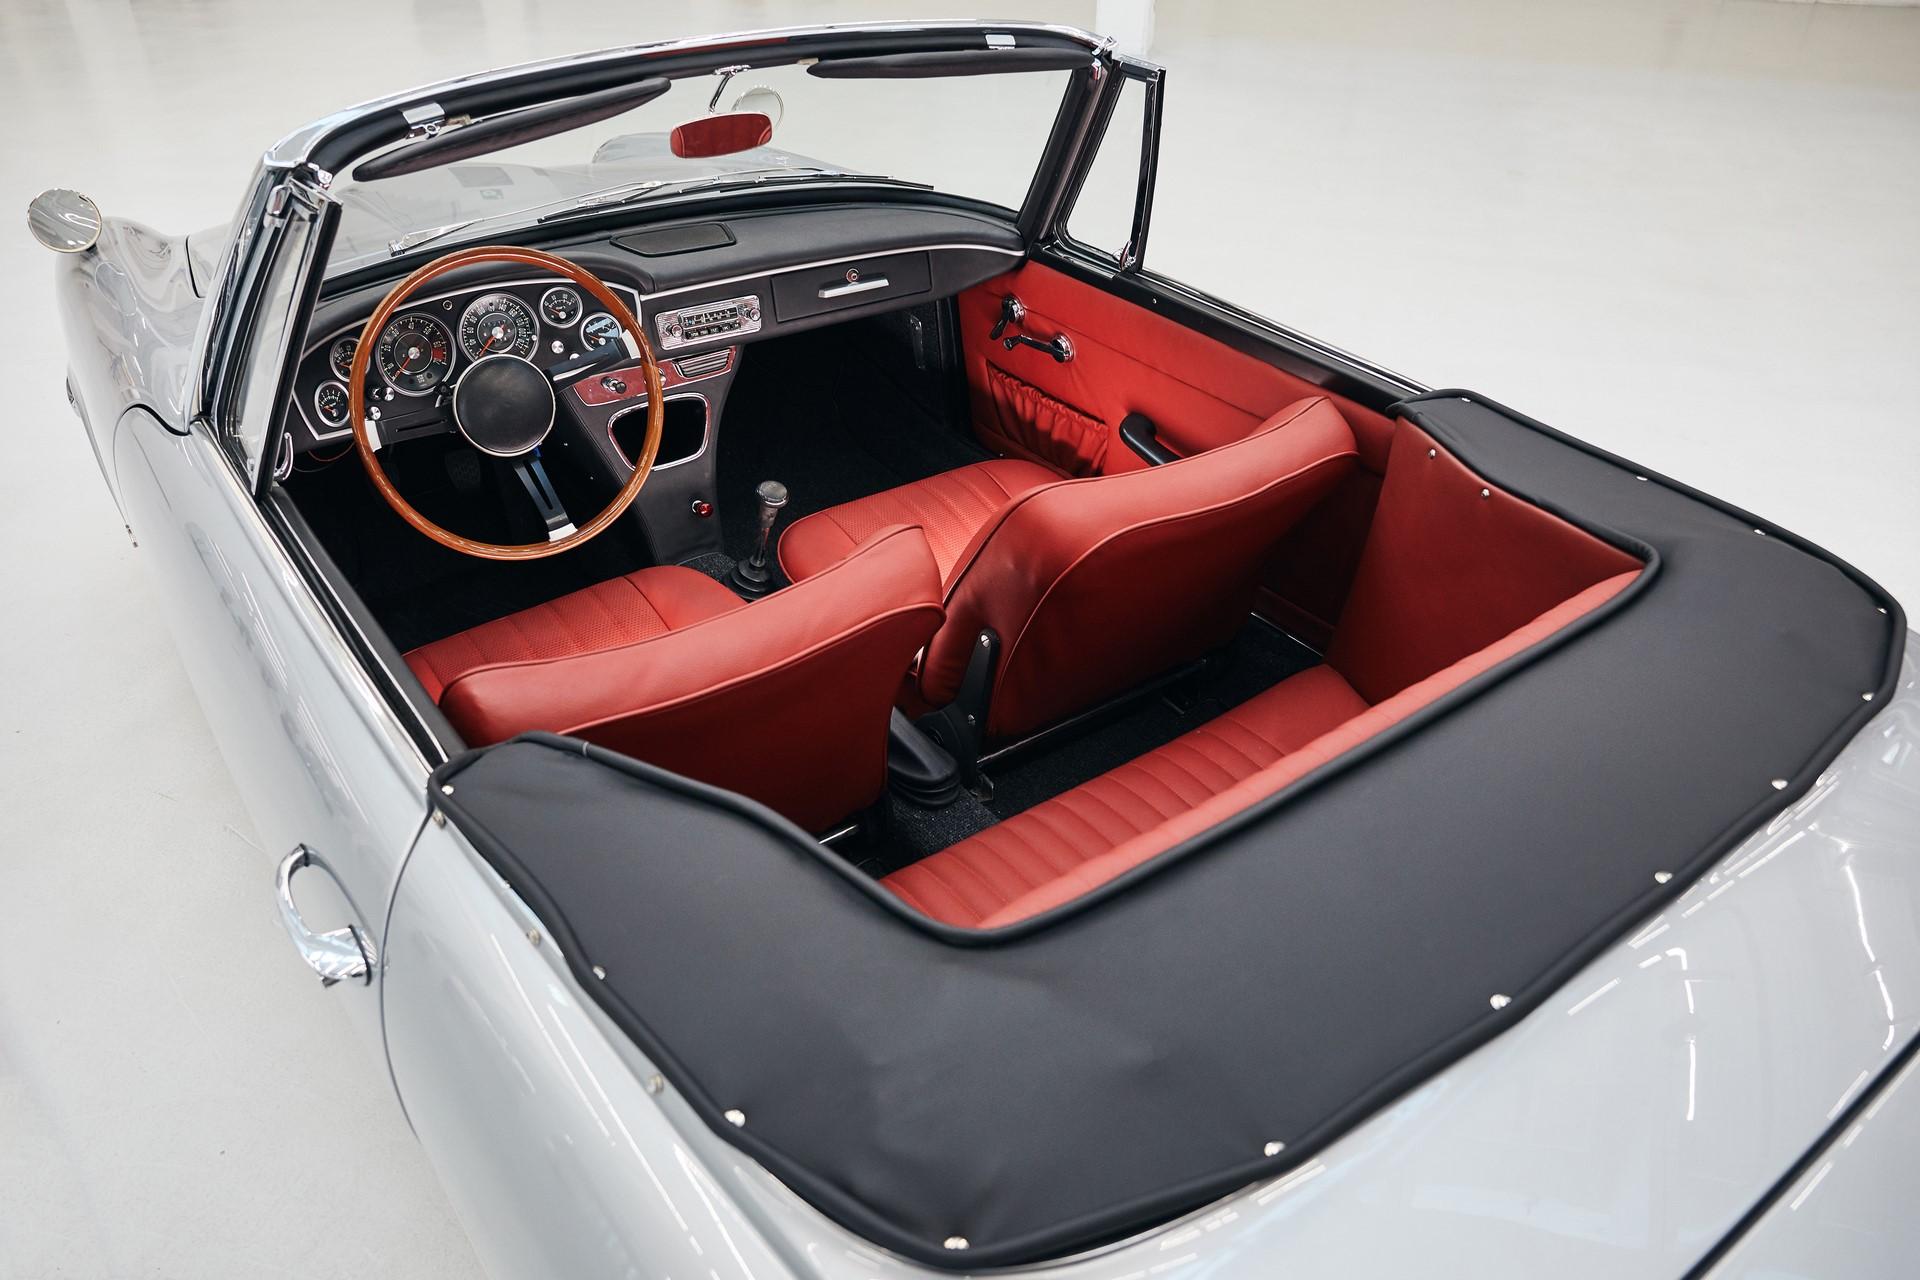 BMW 1600 GT Convertible 1967 (11)